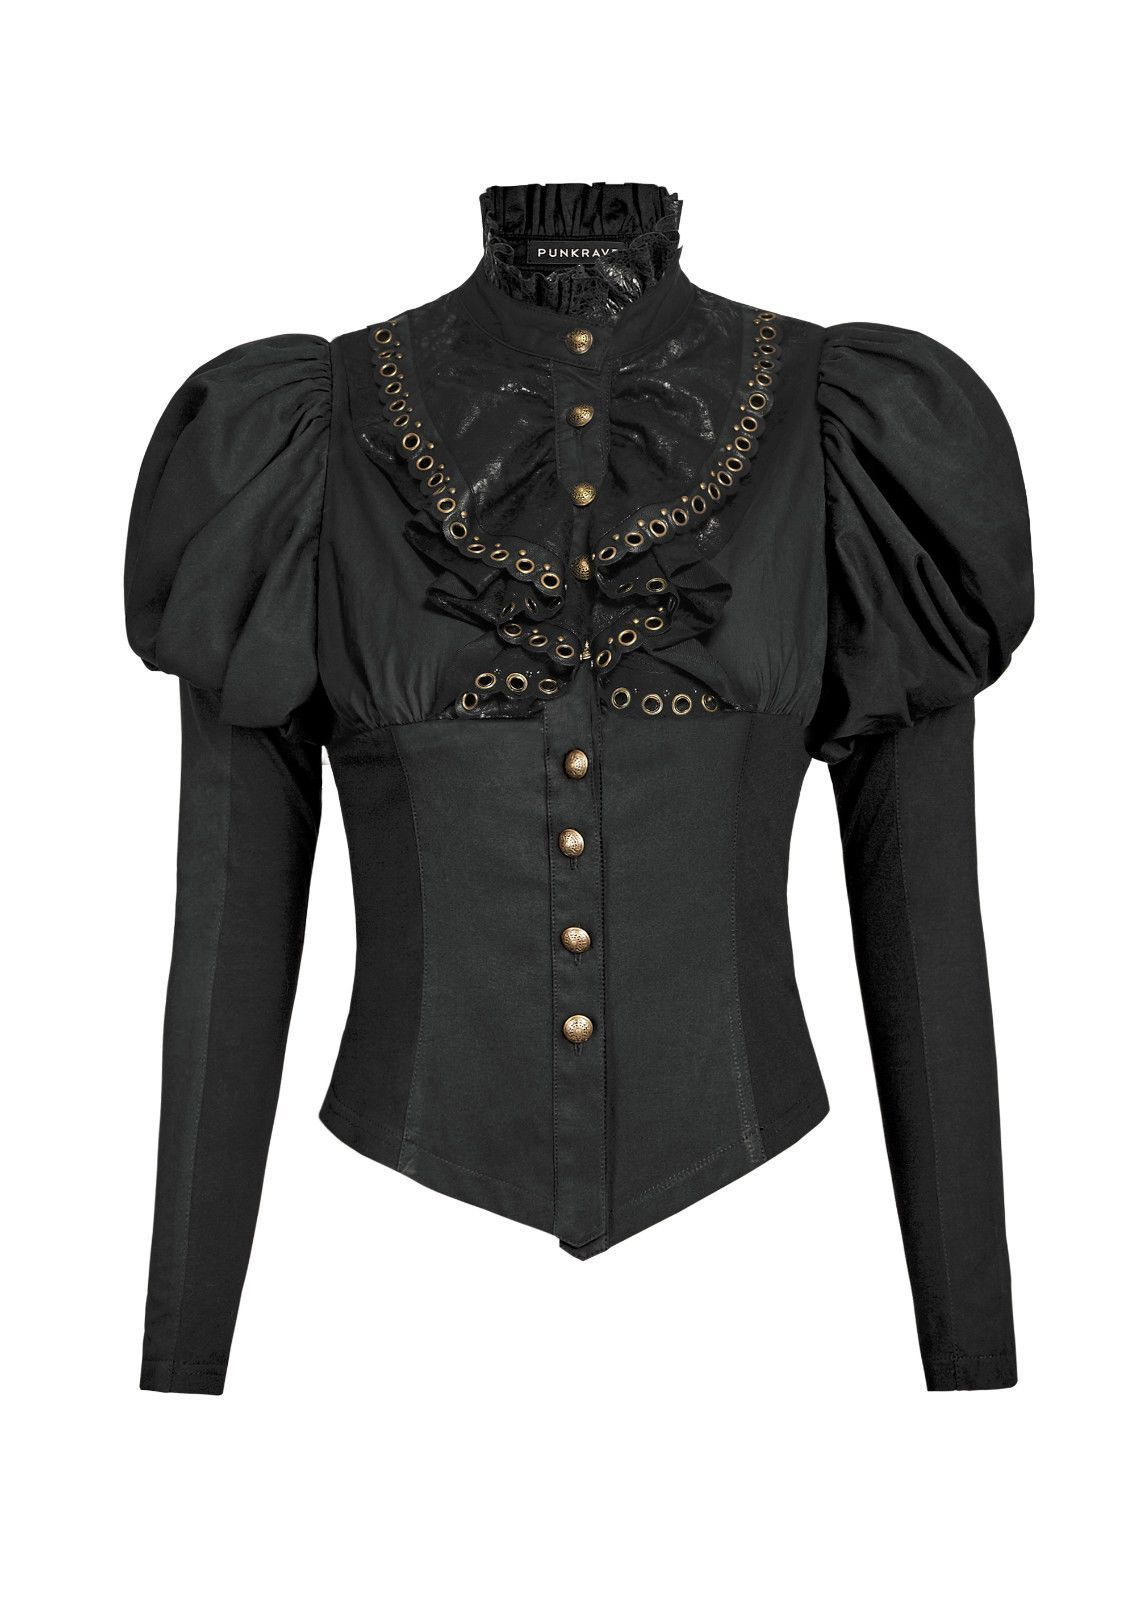 Punk Rave Womens Steampunk Top Black Copper Gothic Dieselpunk Long Sleeve Corset